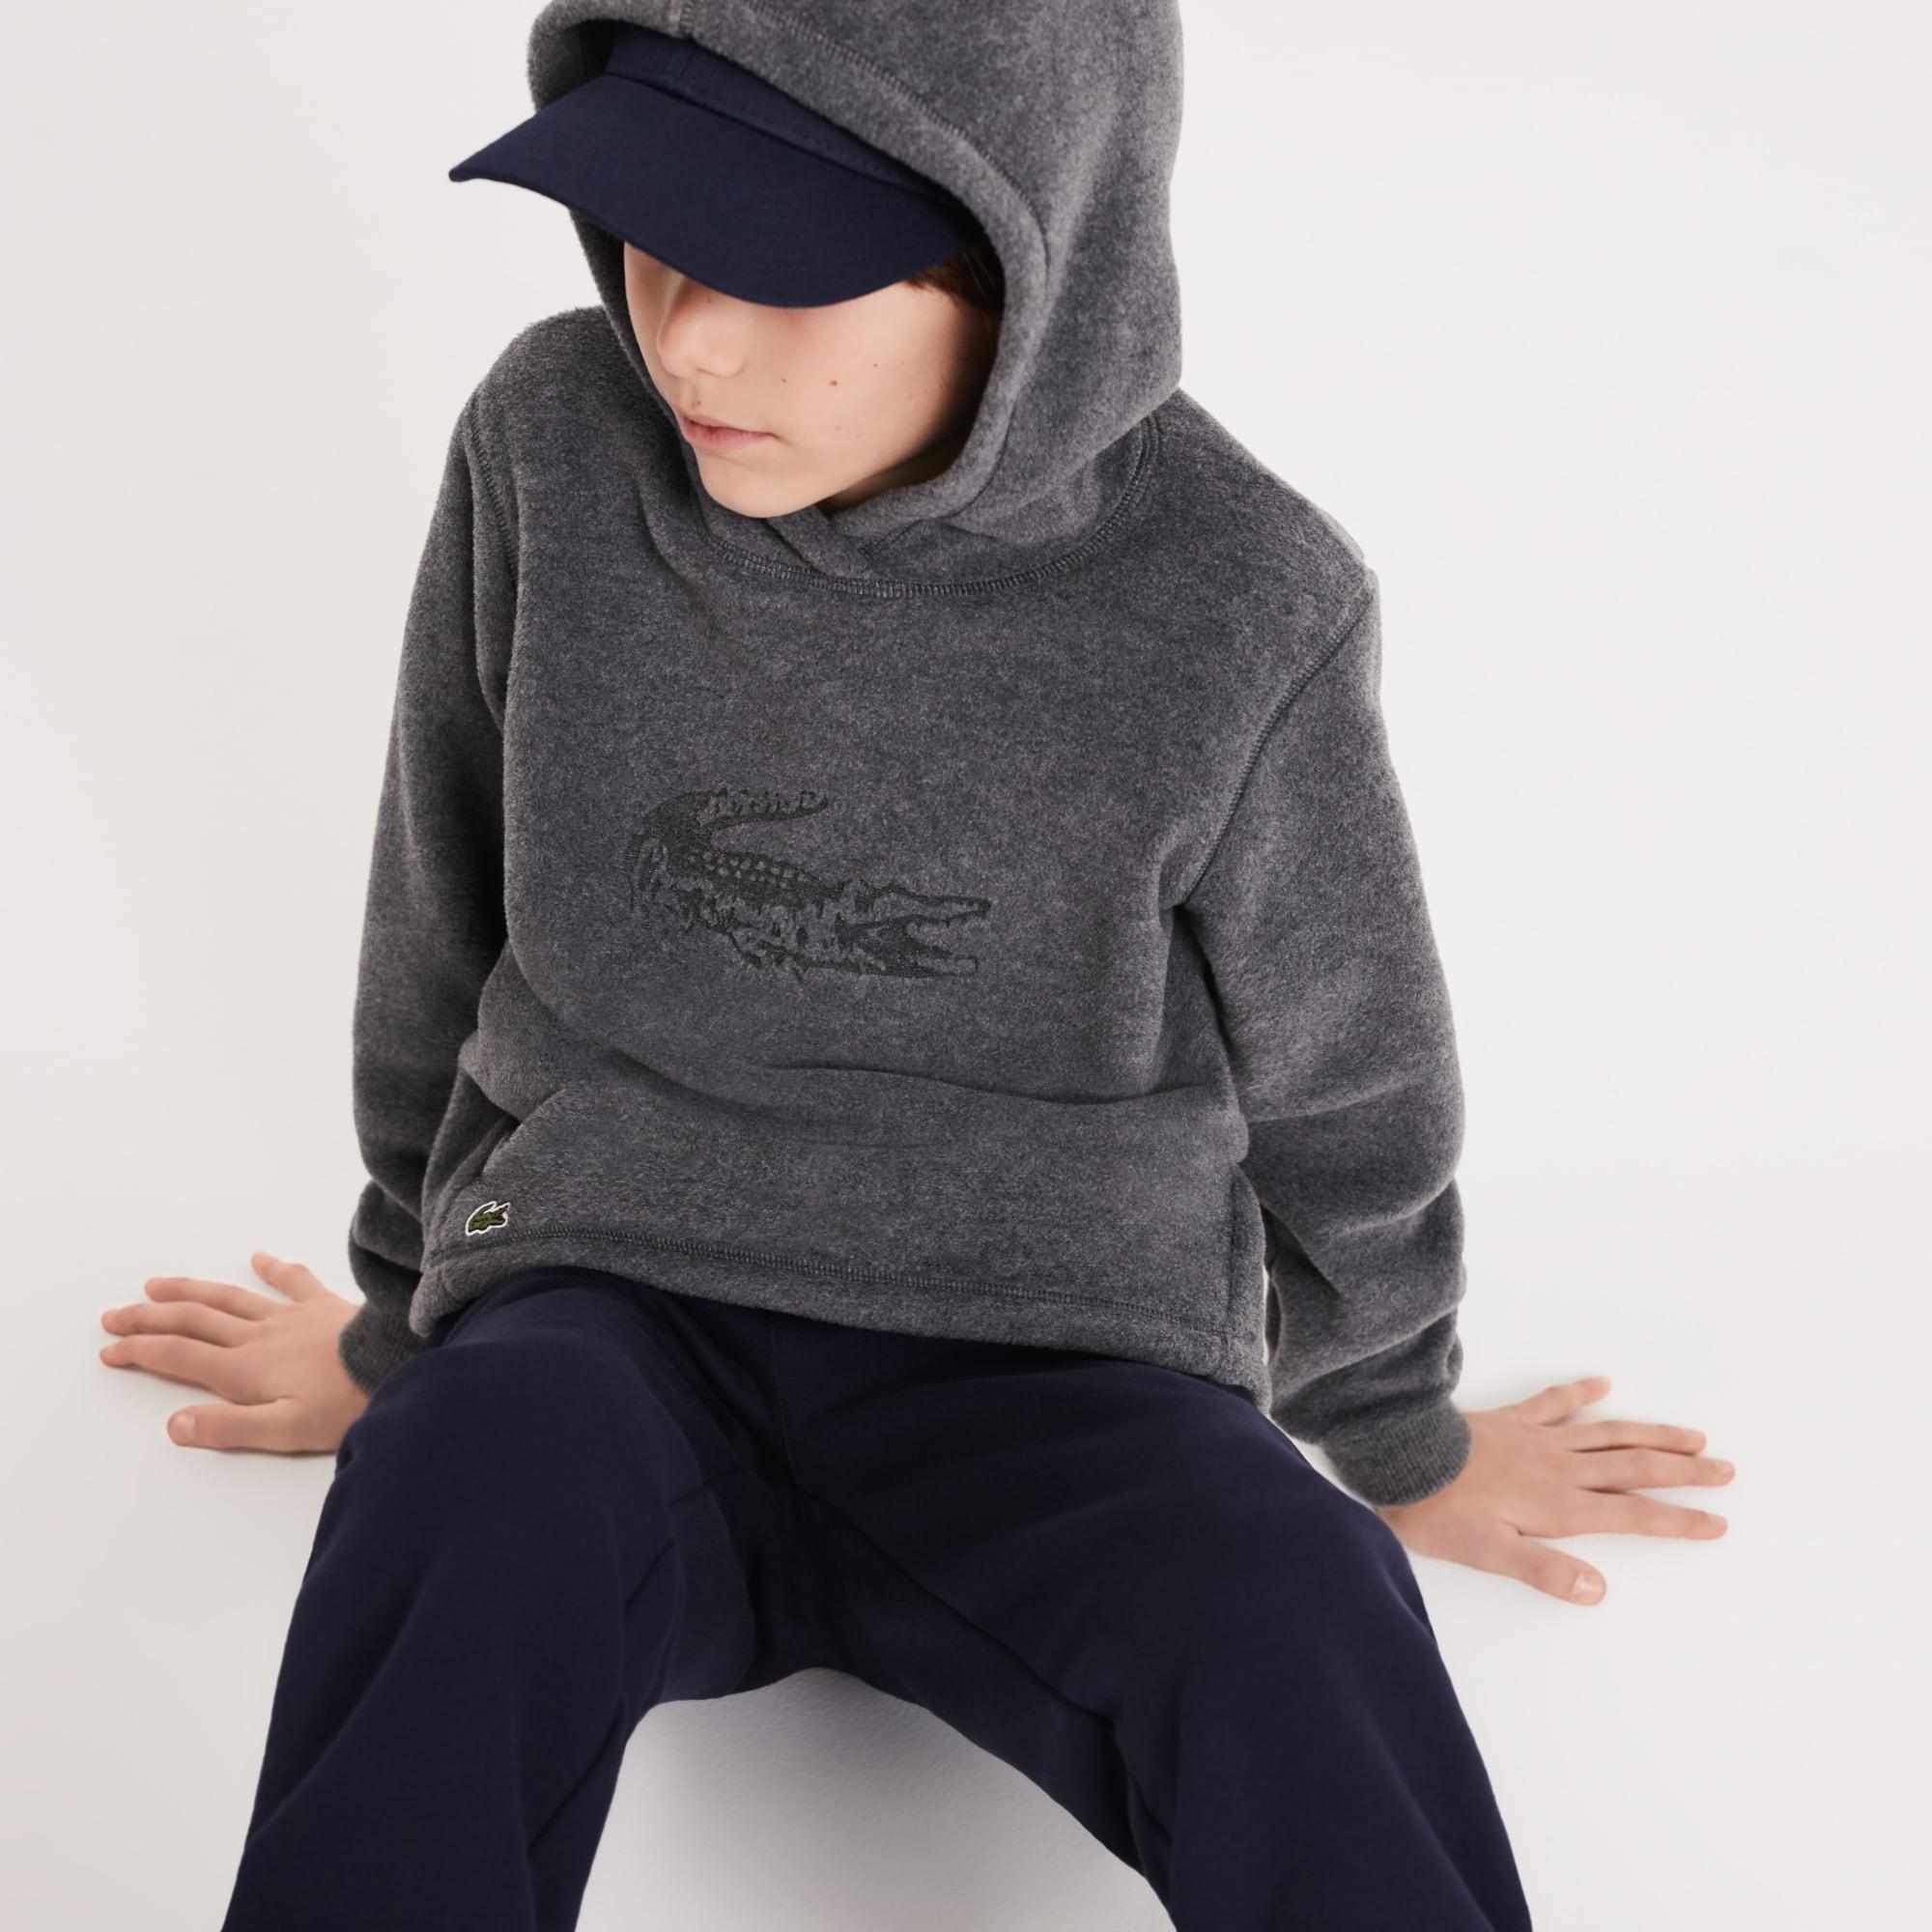 8d9cdab05f7a Boys  Oversized Crocodile Hooded Fleece Sweatshirt